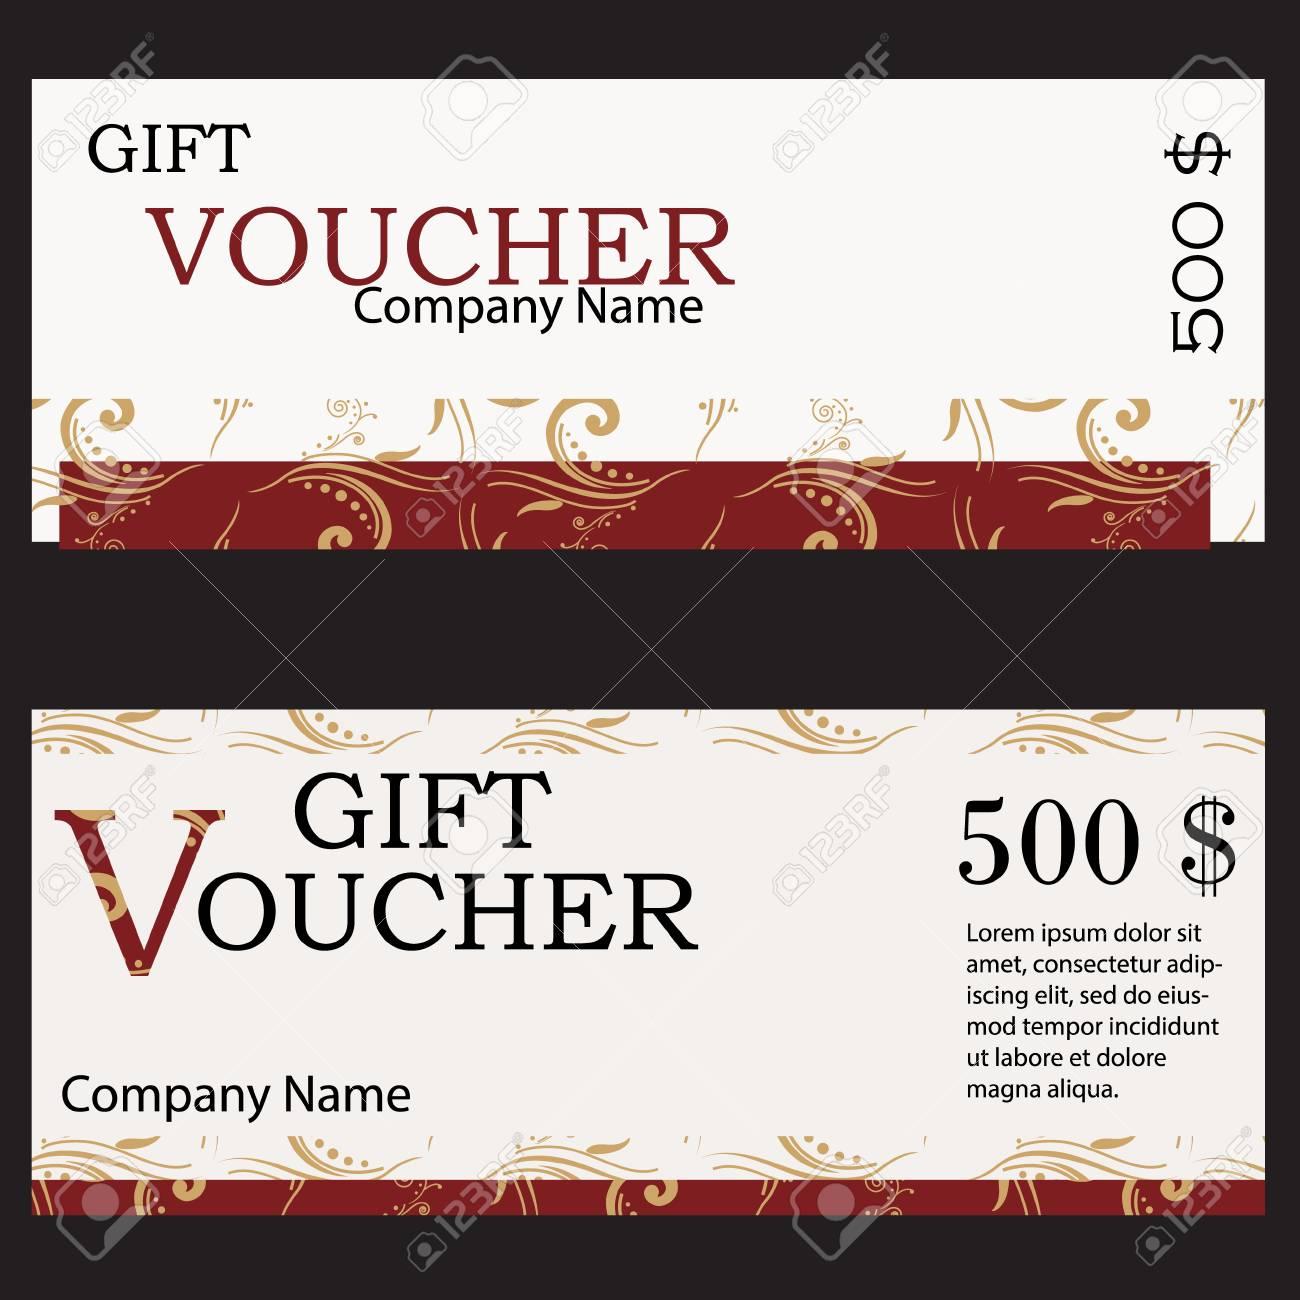 raster illustration gift voucher design template with red golden